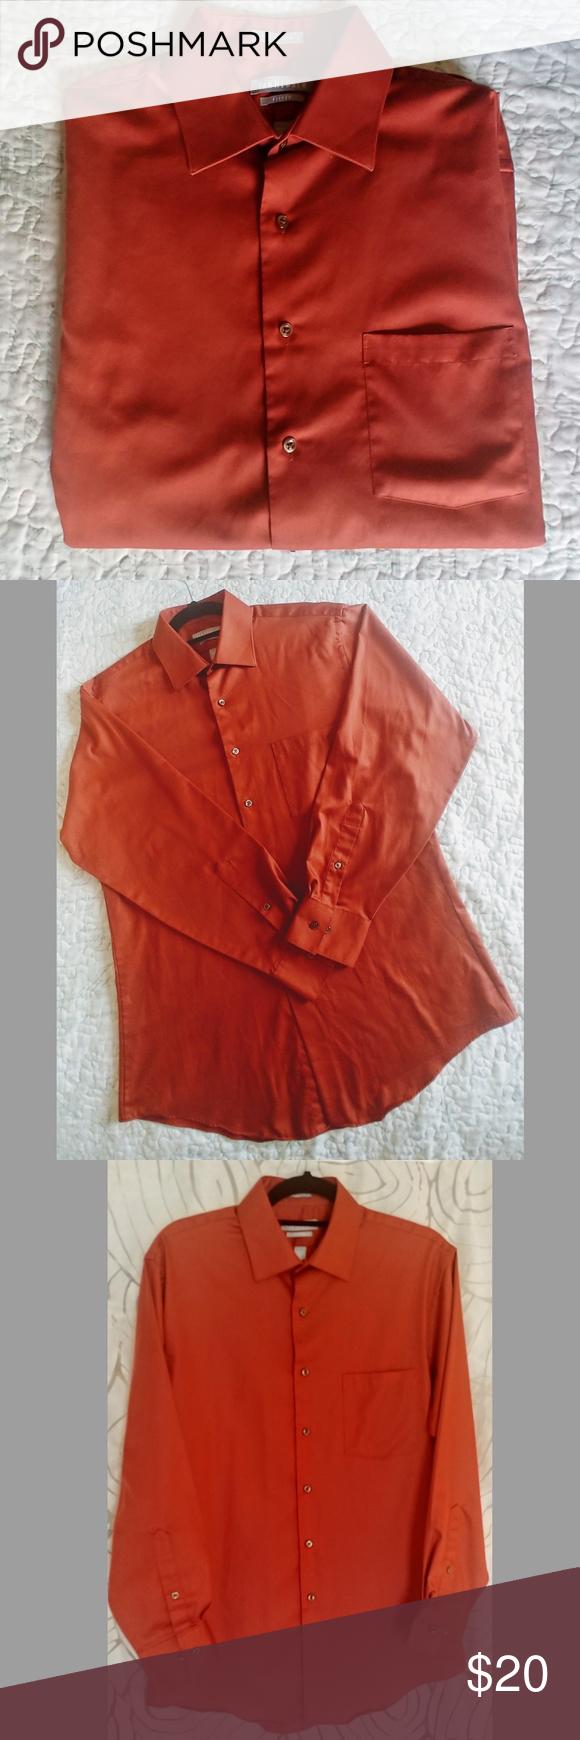 Van Heusen Mens Dress Shirt Van Heusen Mens Dress Shirt Fitten Lux Sateen Size 16 32 33 Burnt Orange Color In Wonderf Mens Shirt Dress Clothes Design Fashion [ 1740 x 580 Pixel ]